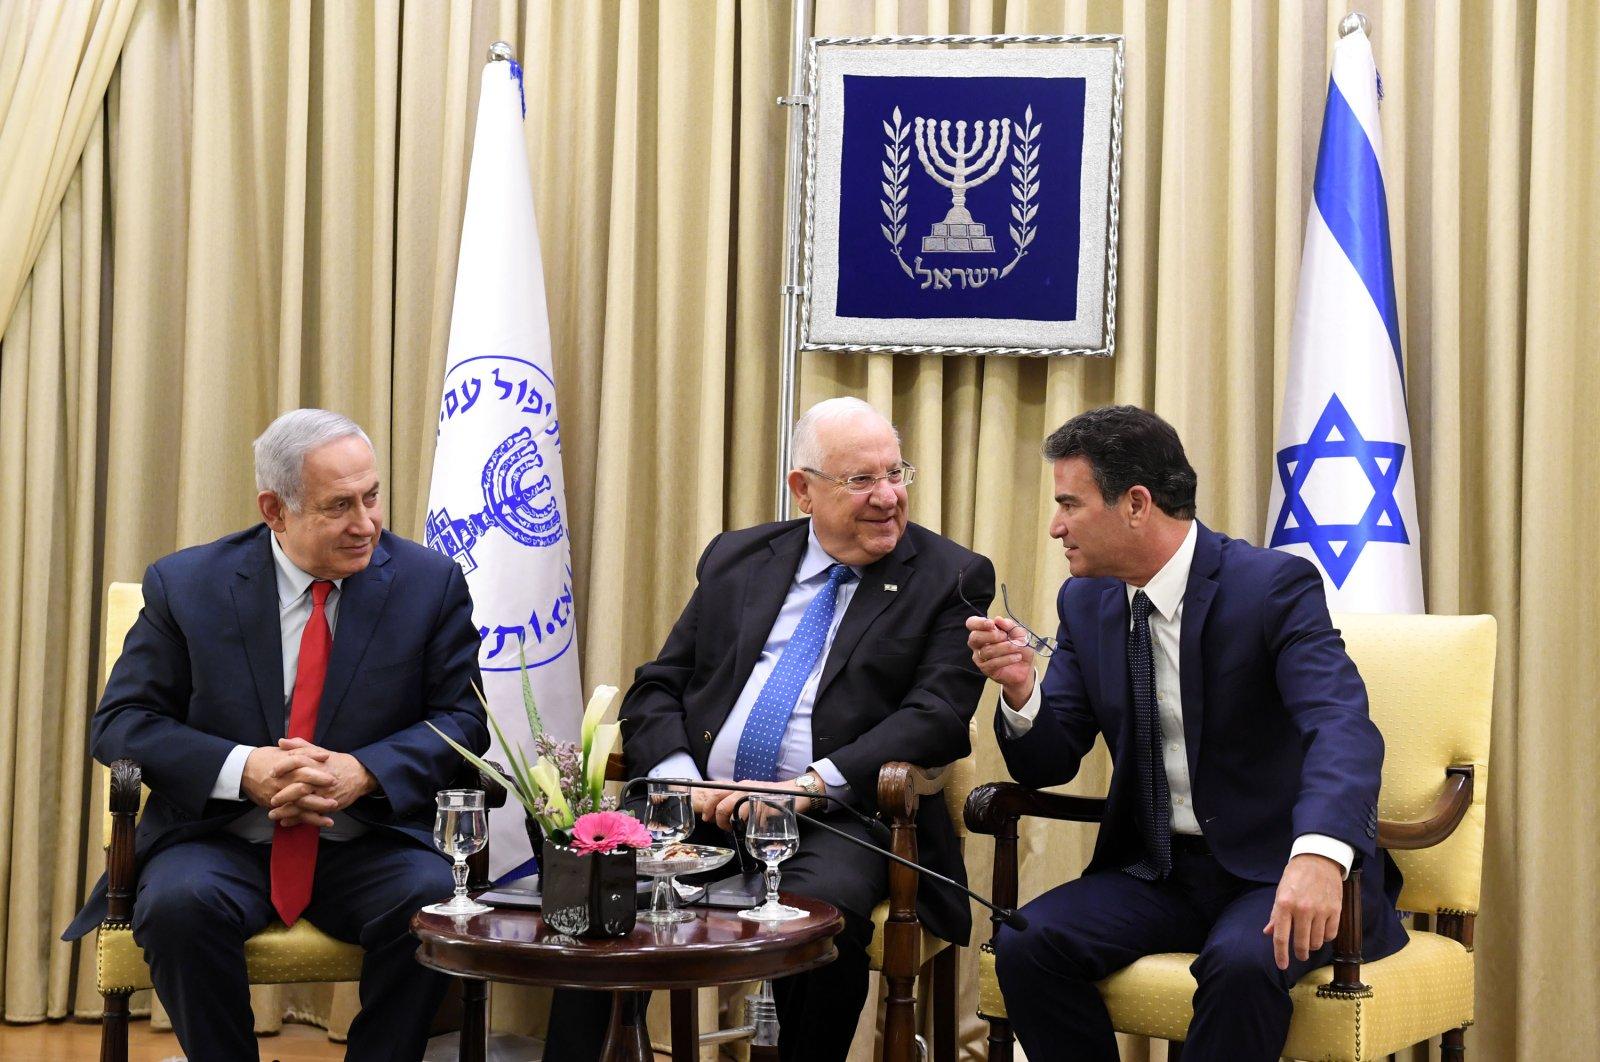 Israel's President Reuven Rivlin (C), Prime Minister Benjamin Netanyahu (L) and the head of the Mossad Yossi Cohen (R) award certificates to Mossad employees. (Photo: Kobi Gideon / GPO Israel)